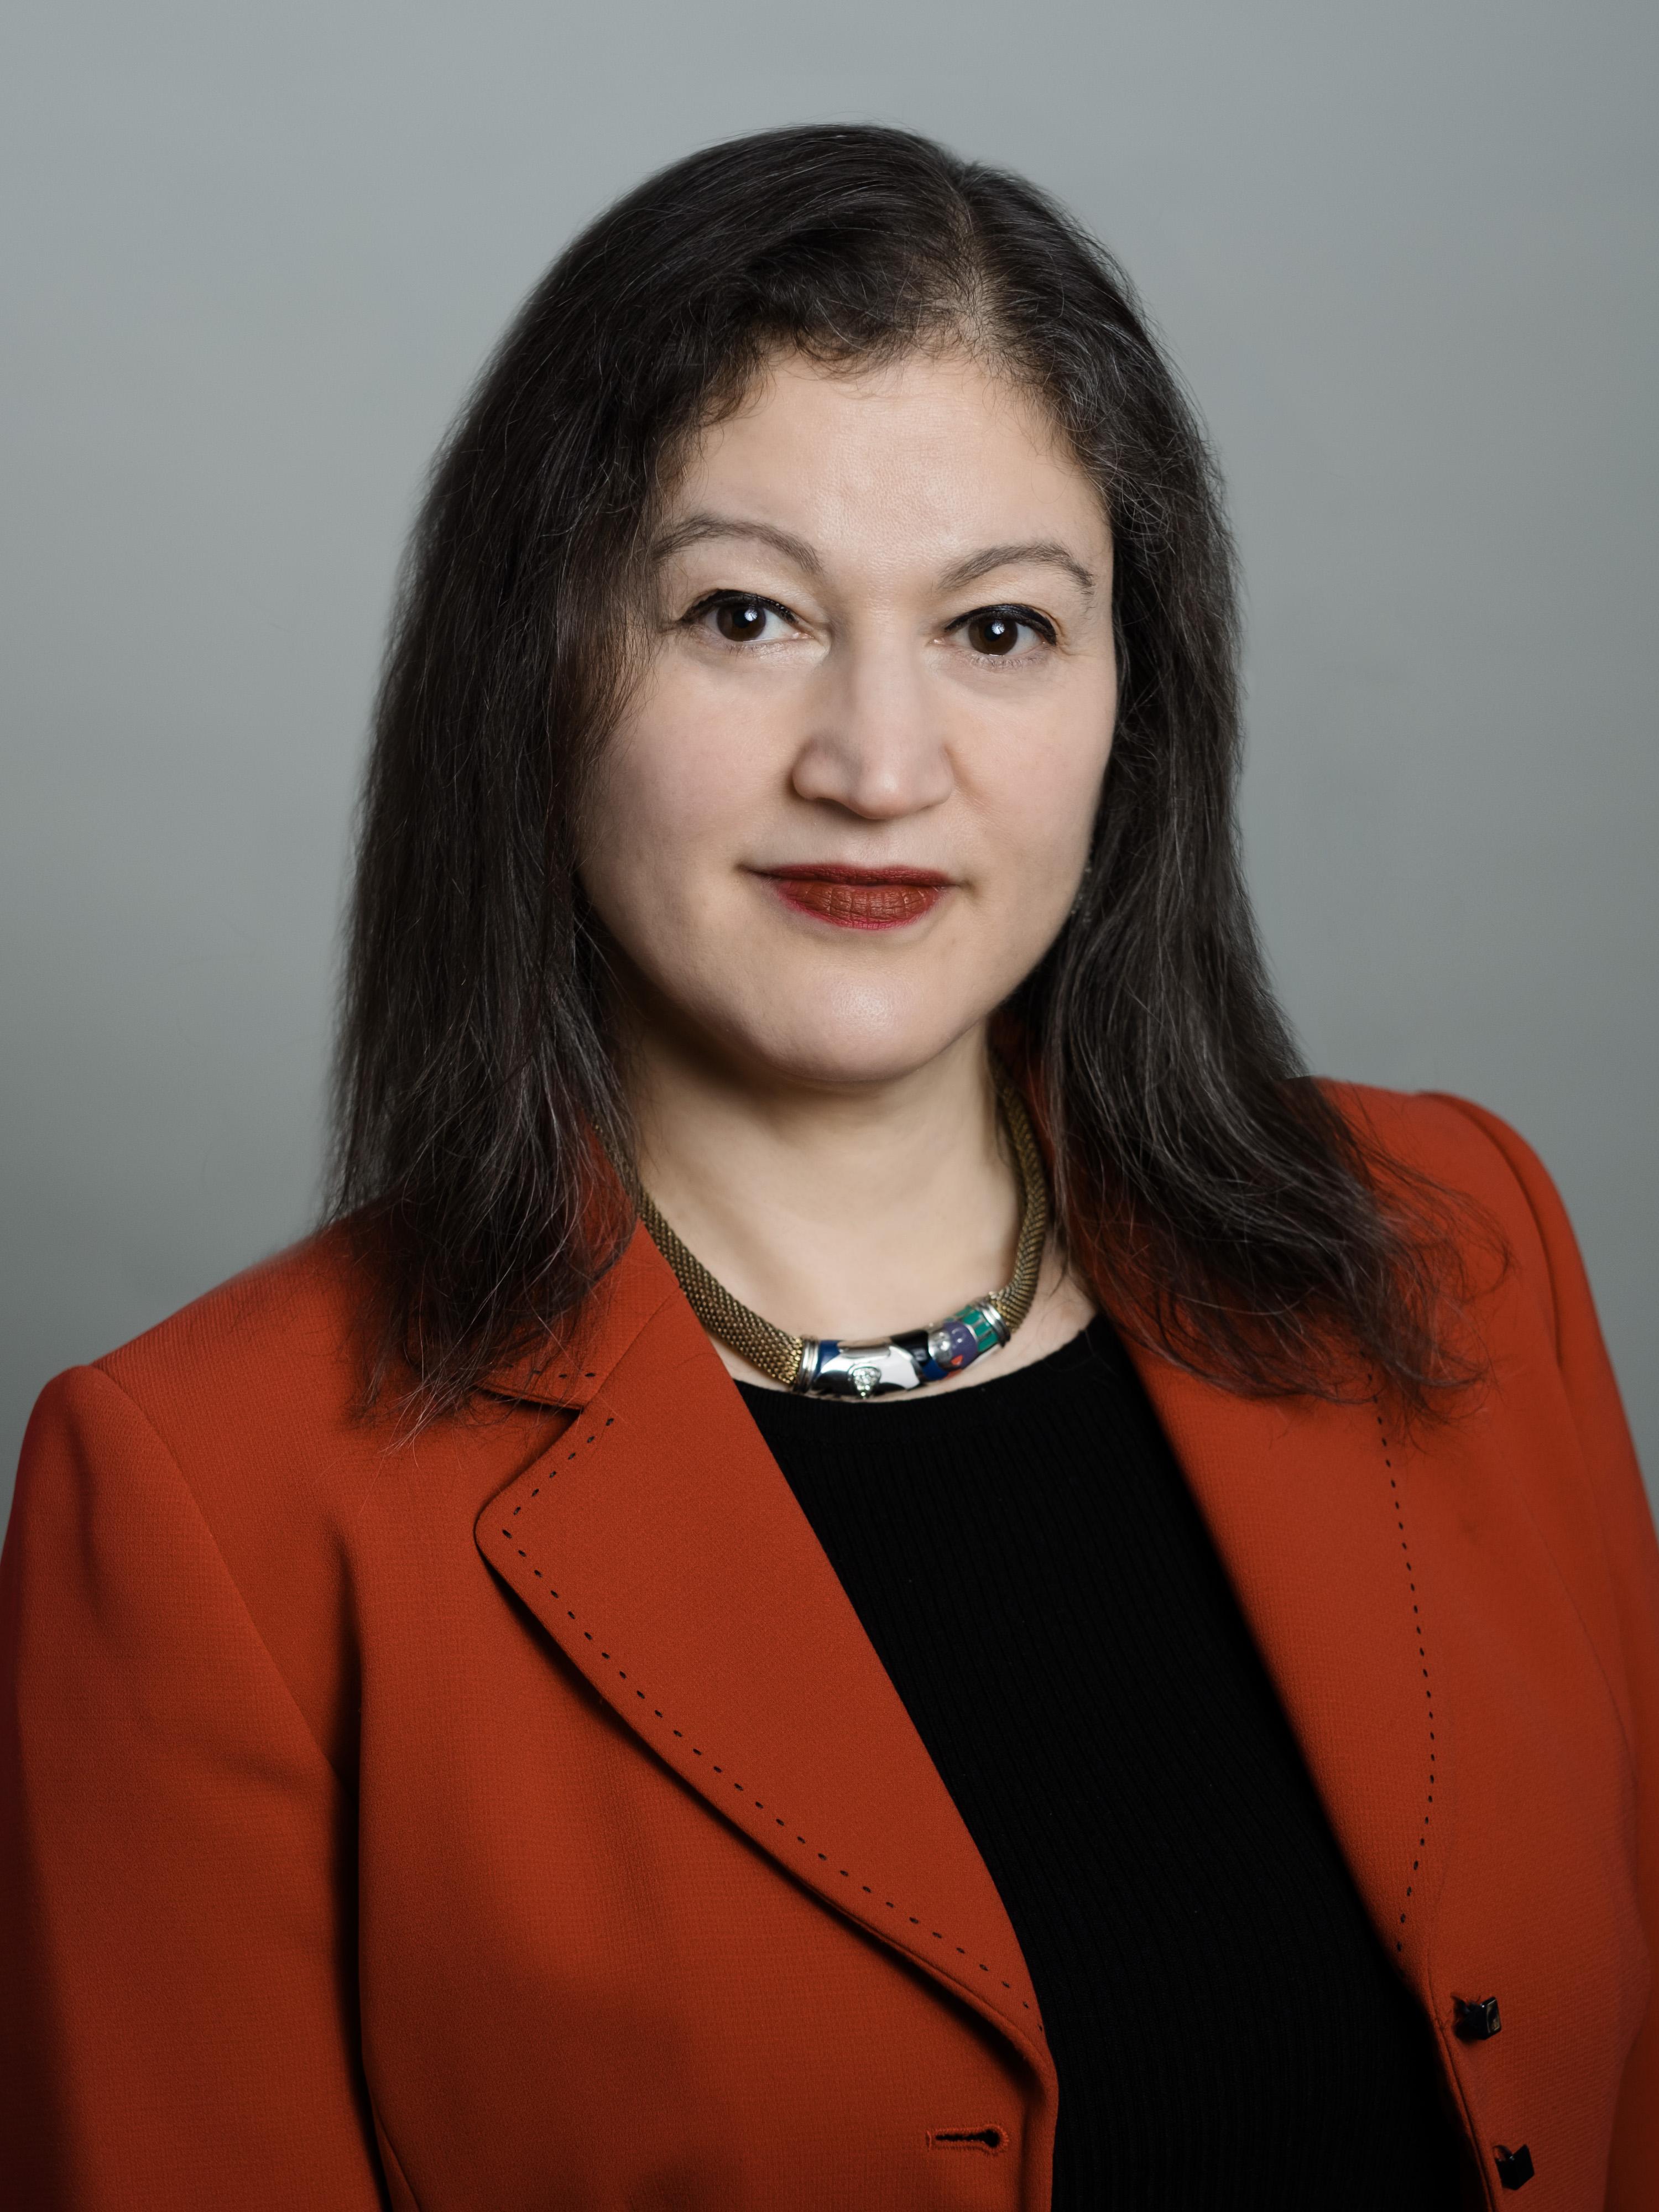 Rachel Antman